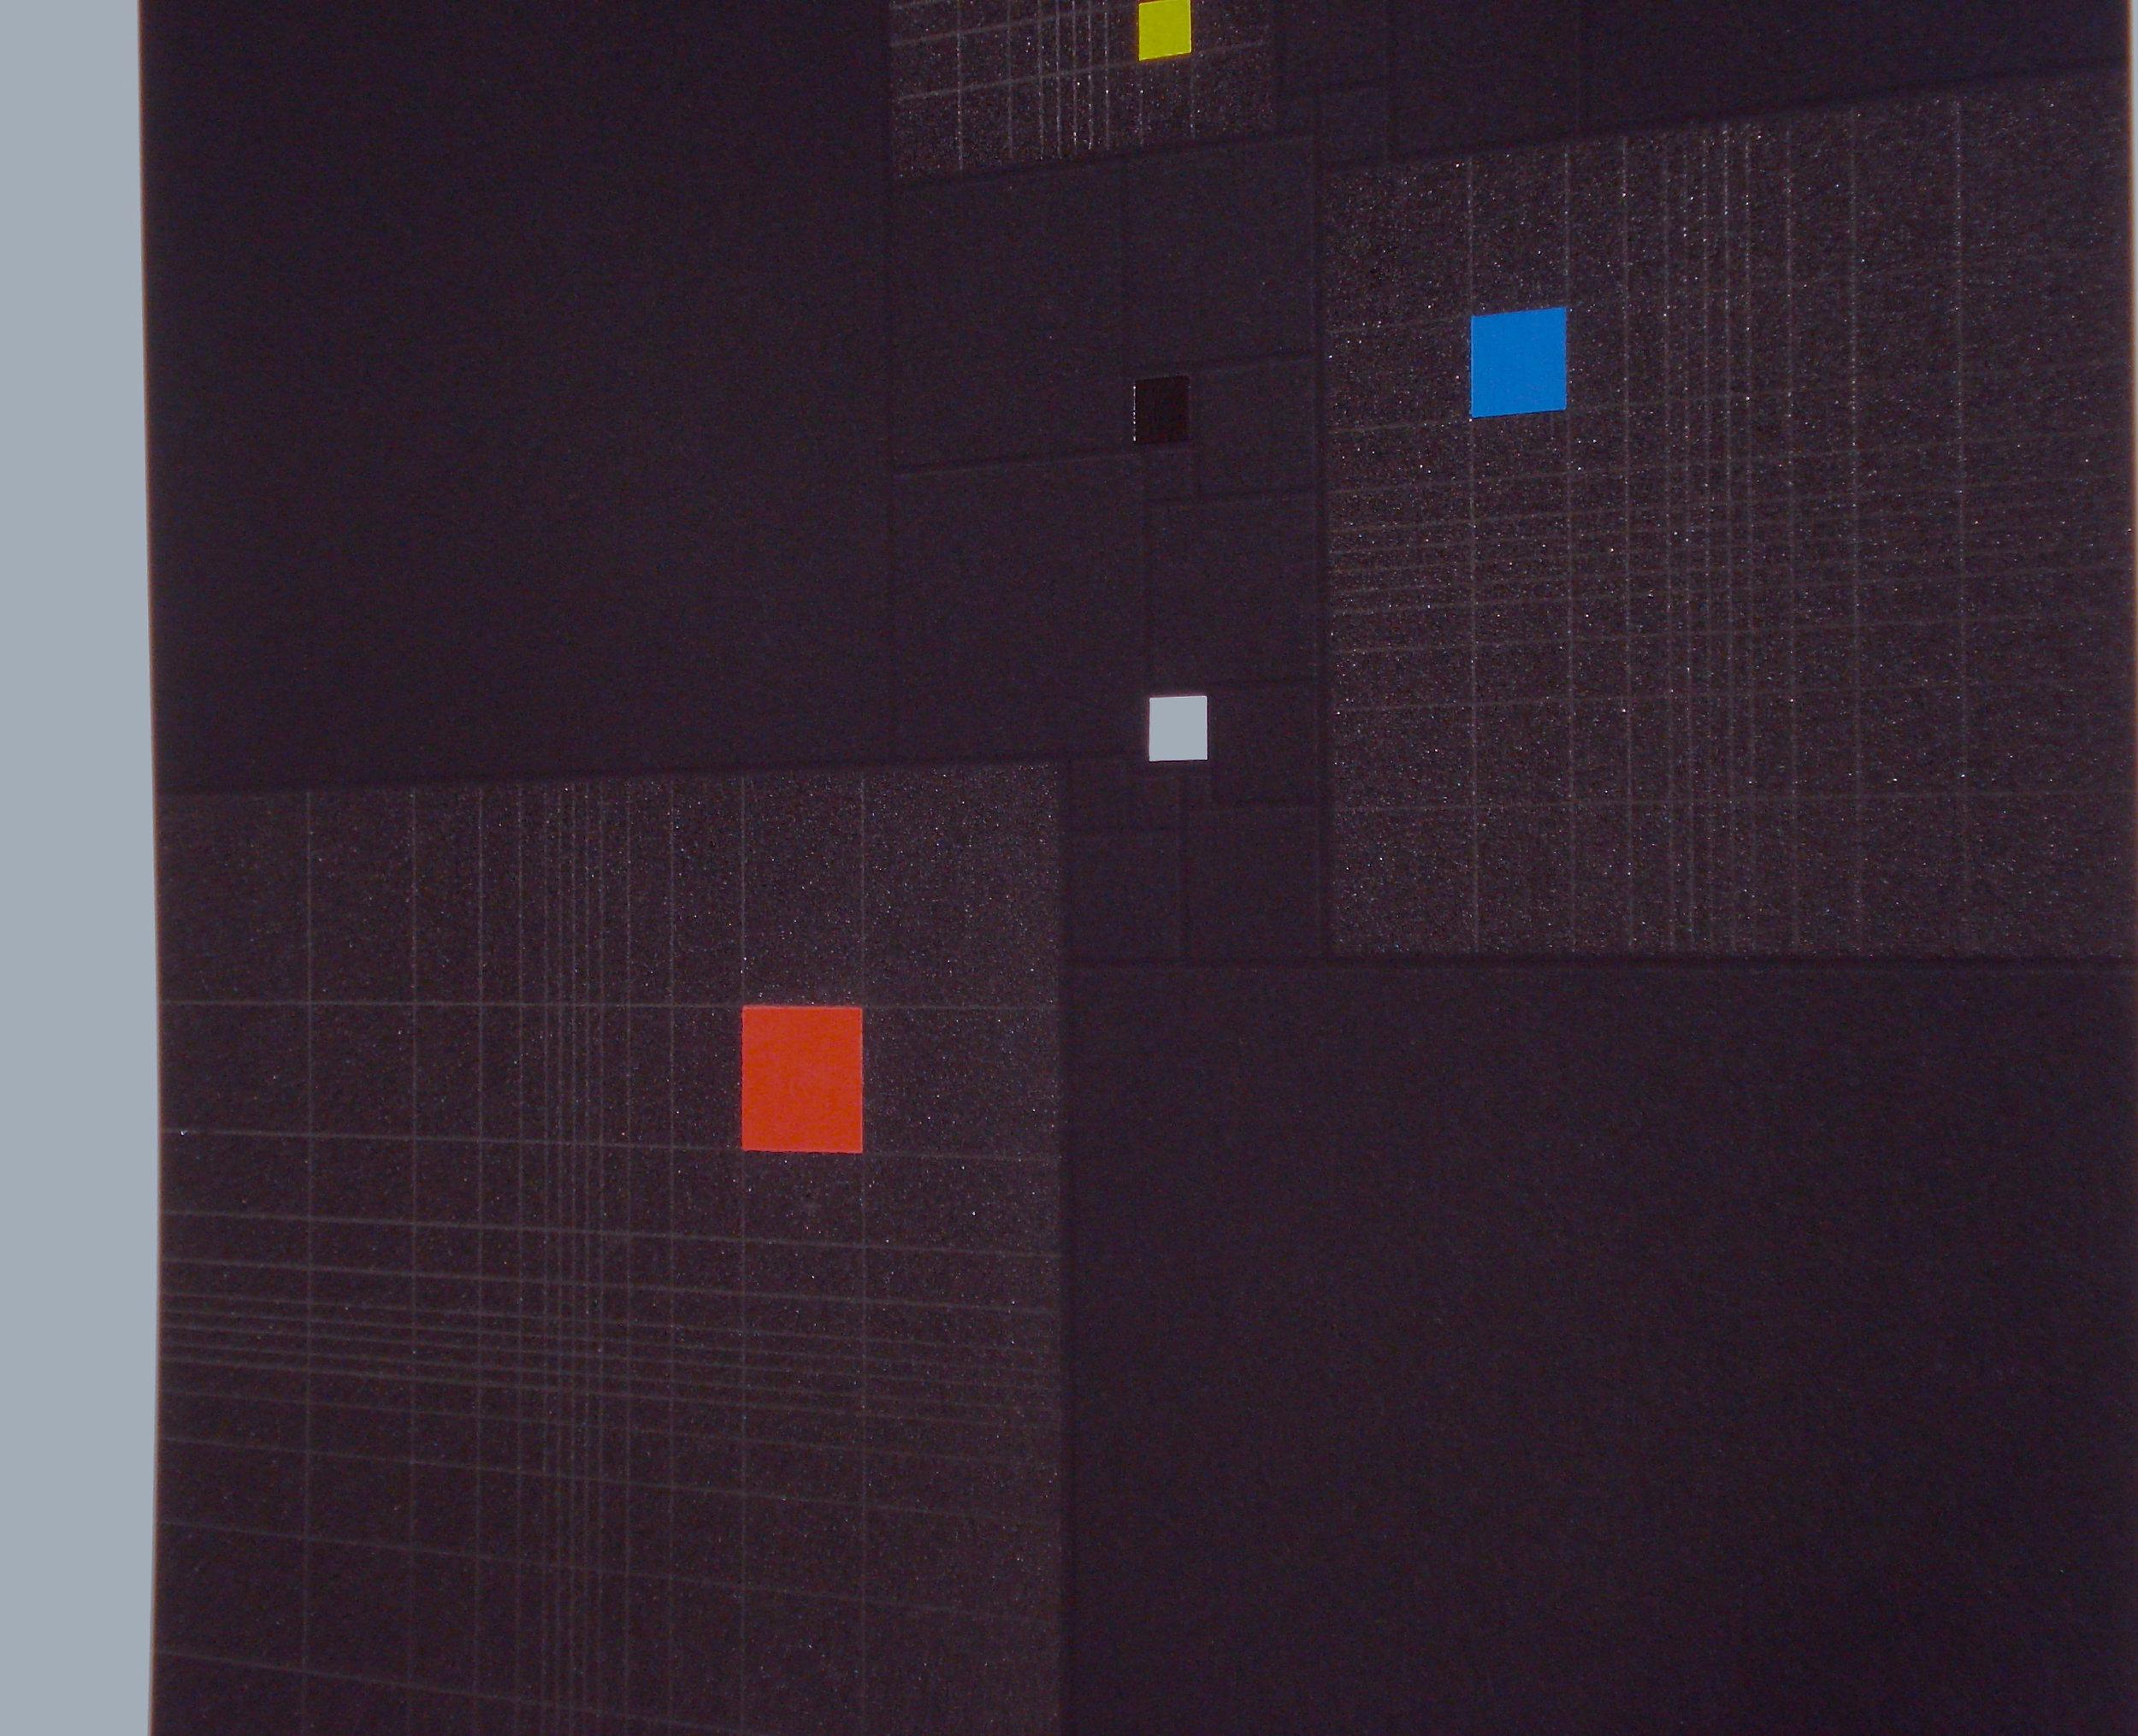 Squares in Square + Fibonacci-sequence [20170313-2], 2017, pigment, acrylic on paper, 14 x 13 13/16 in. [35.5x35cm]3